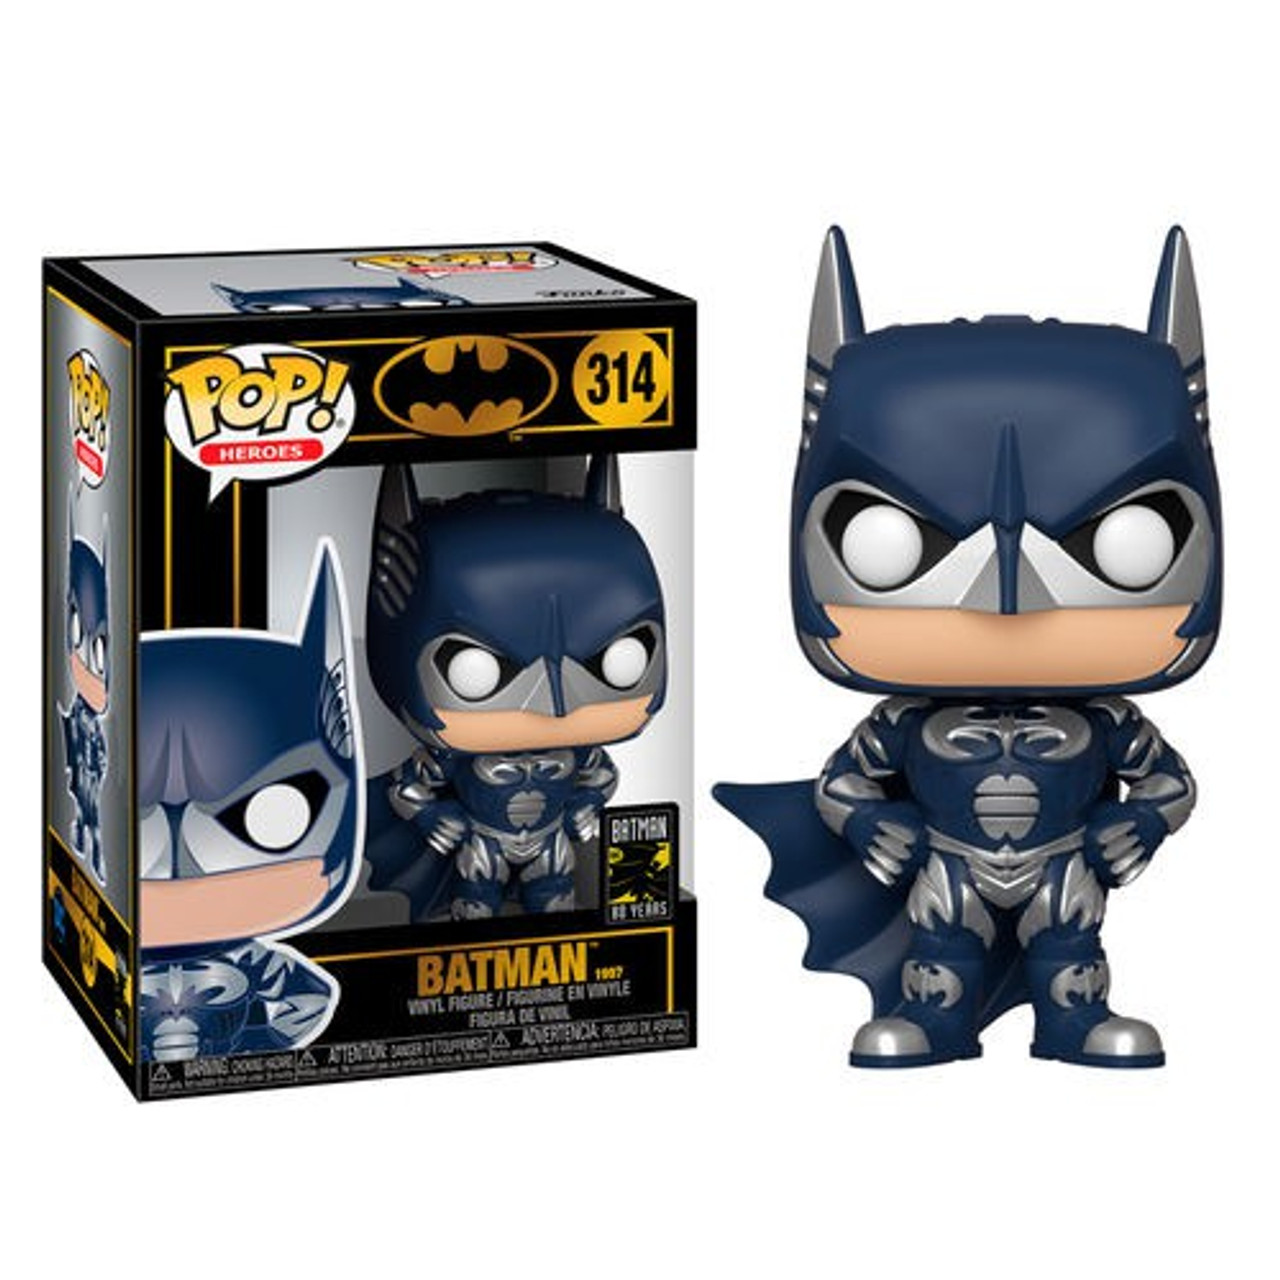 FUNKO POP DC:BATMAN 80TH BATMAN 1997 VINYL FIGURE #314